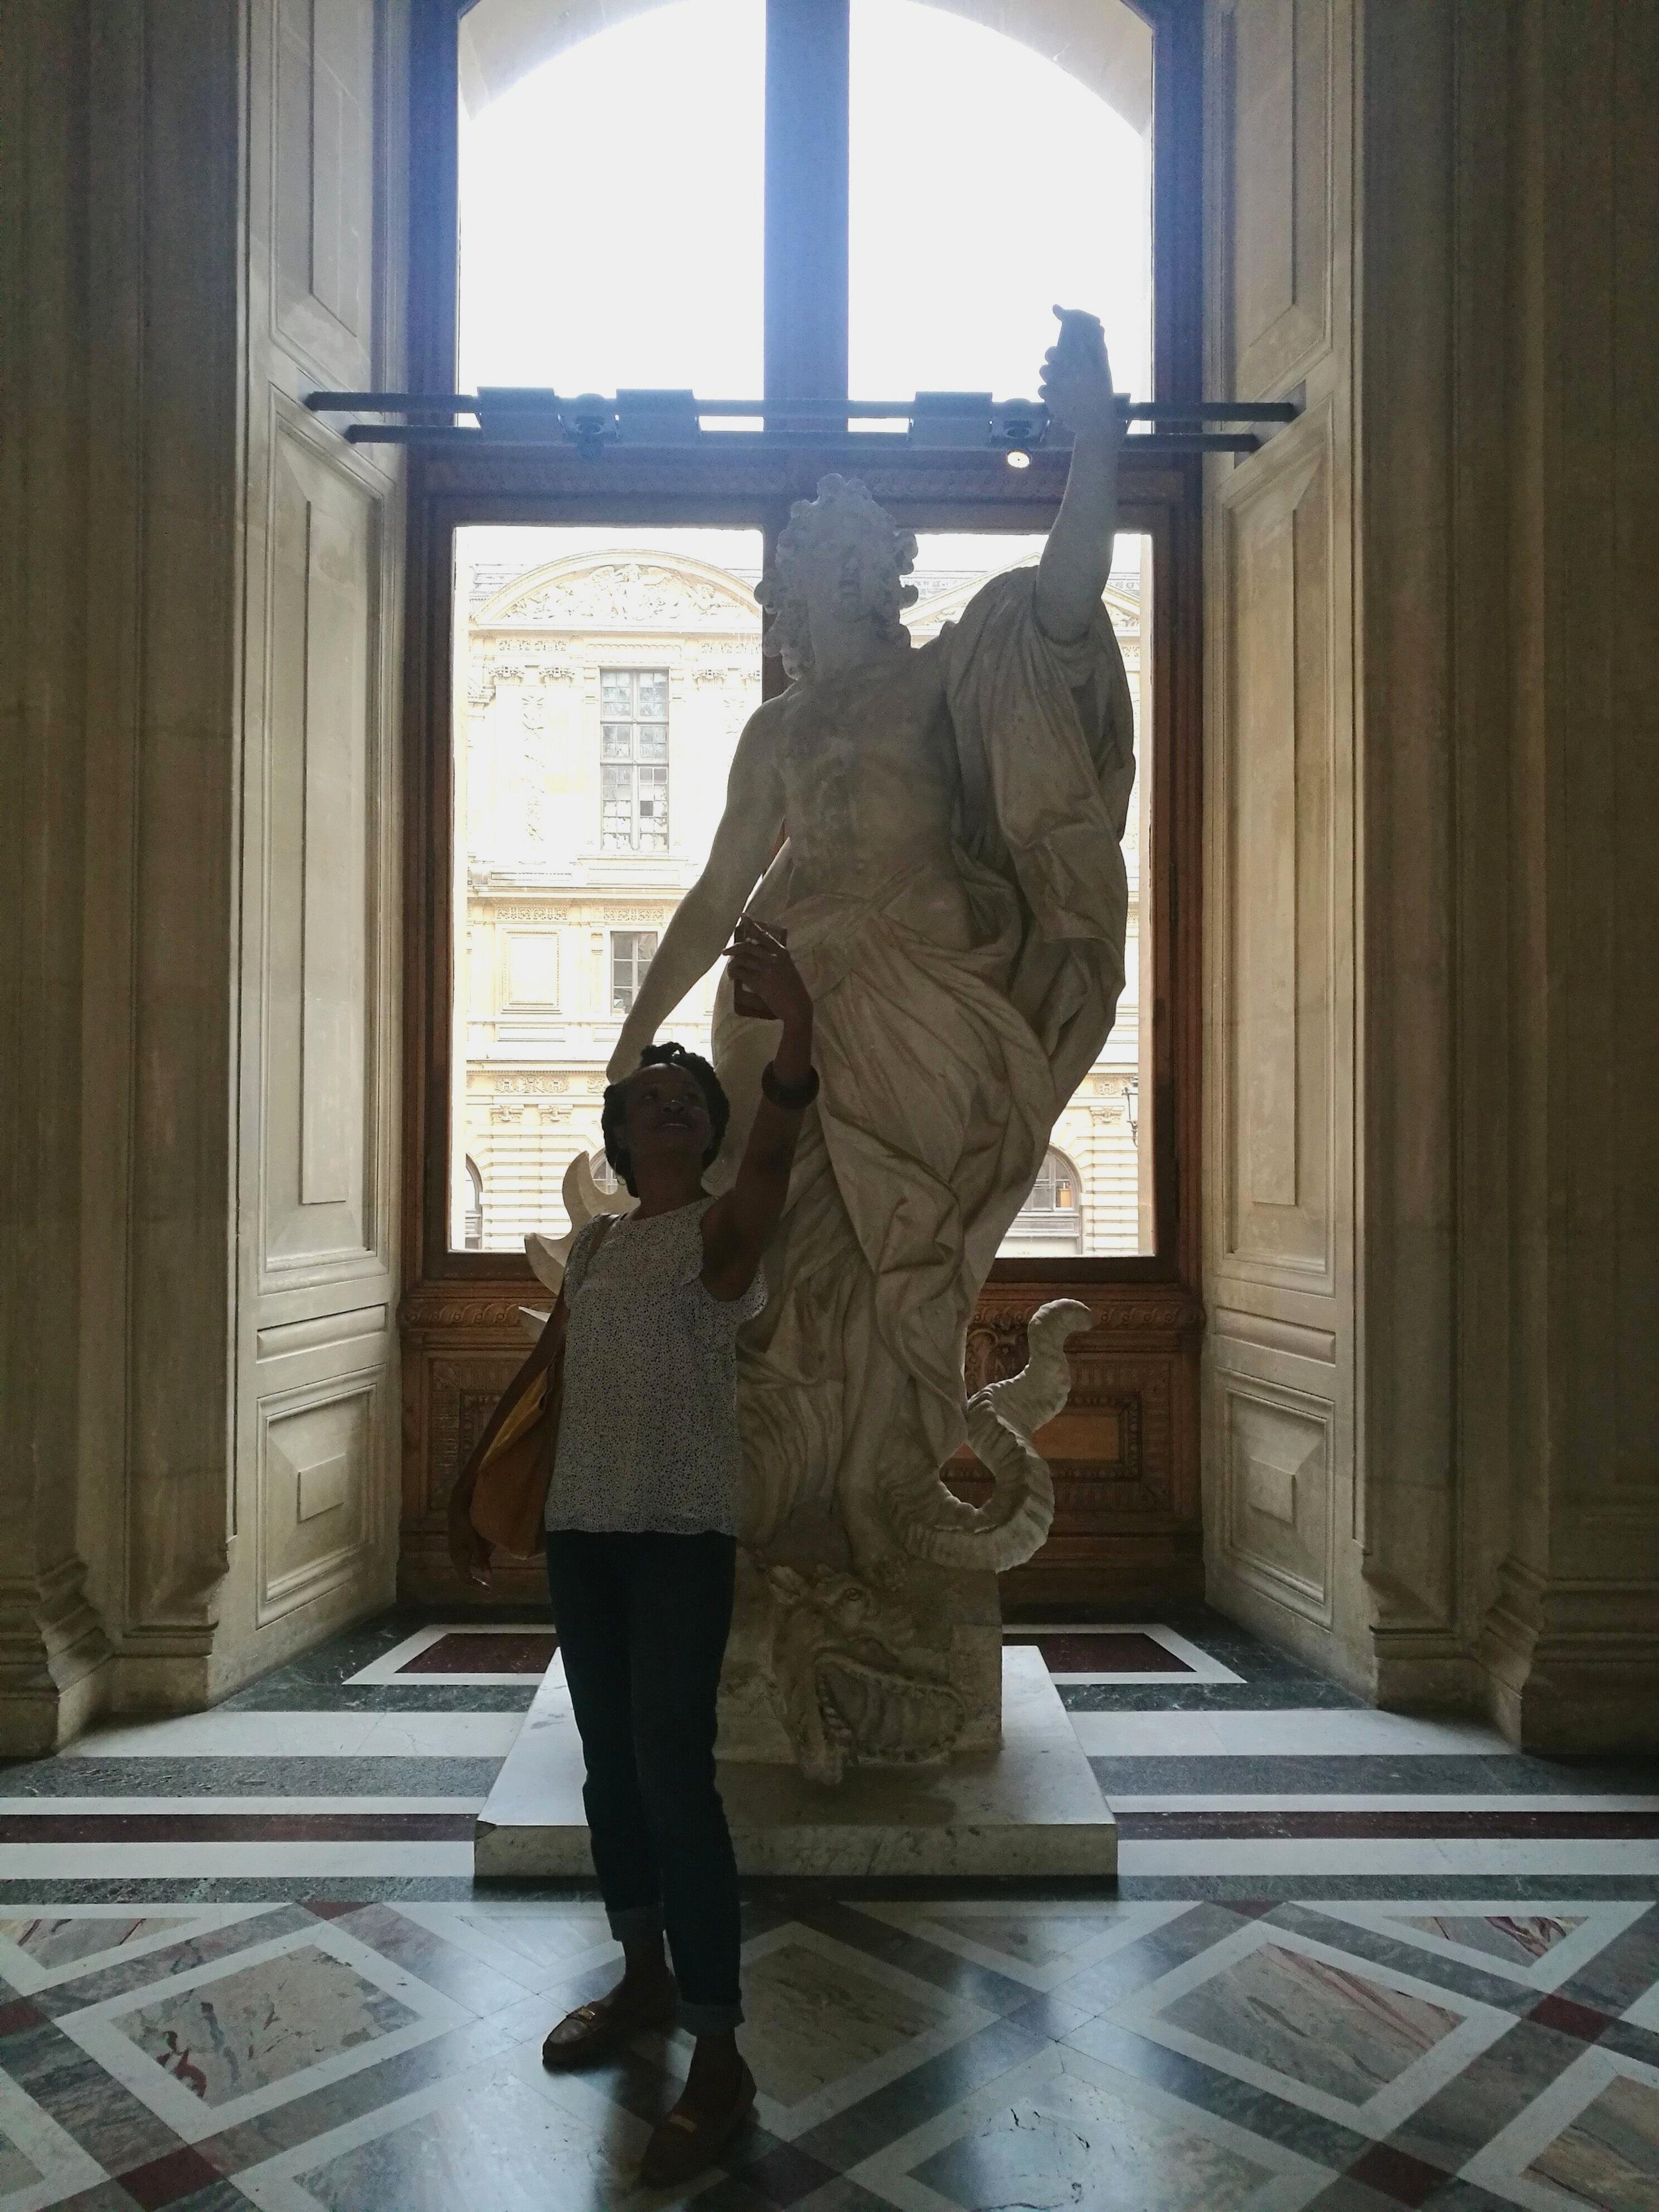 At the Louvre, Paris. Summer 2018.